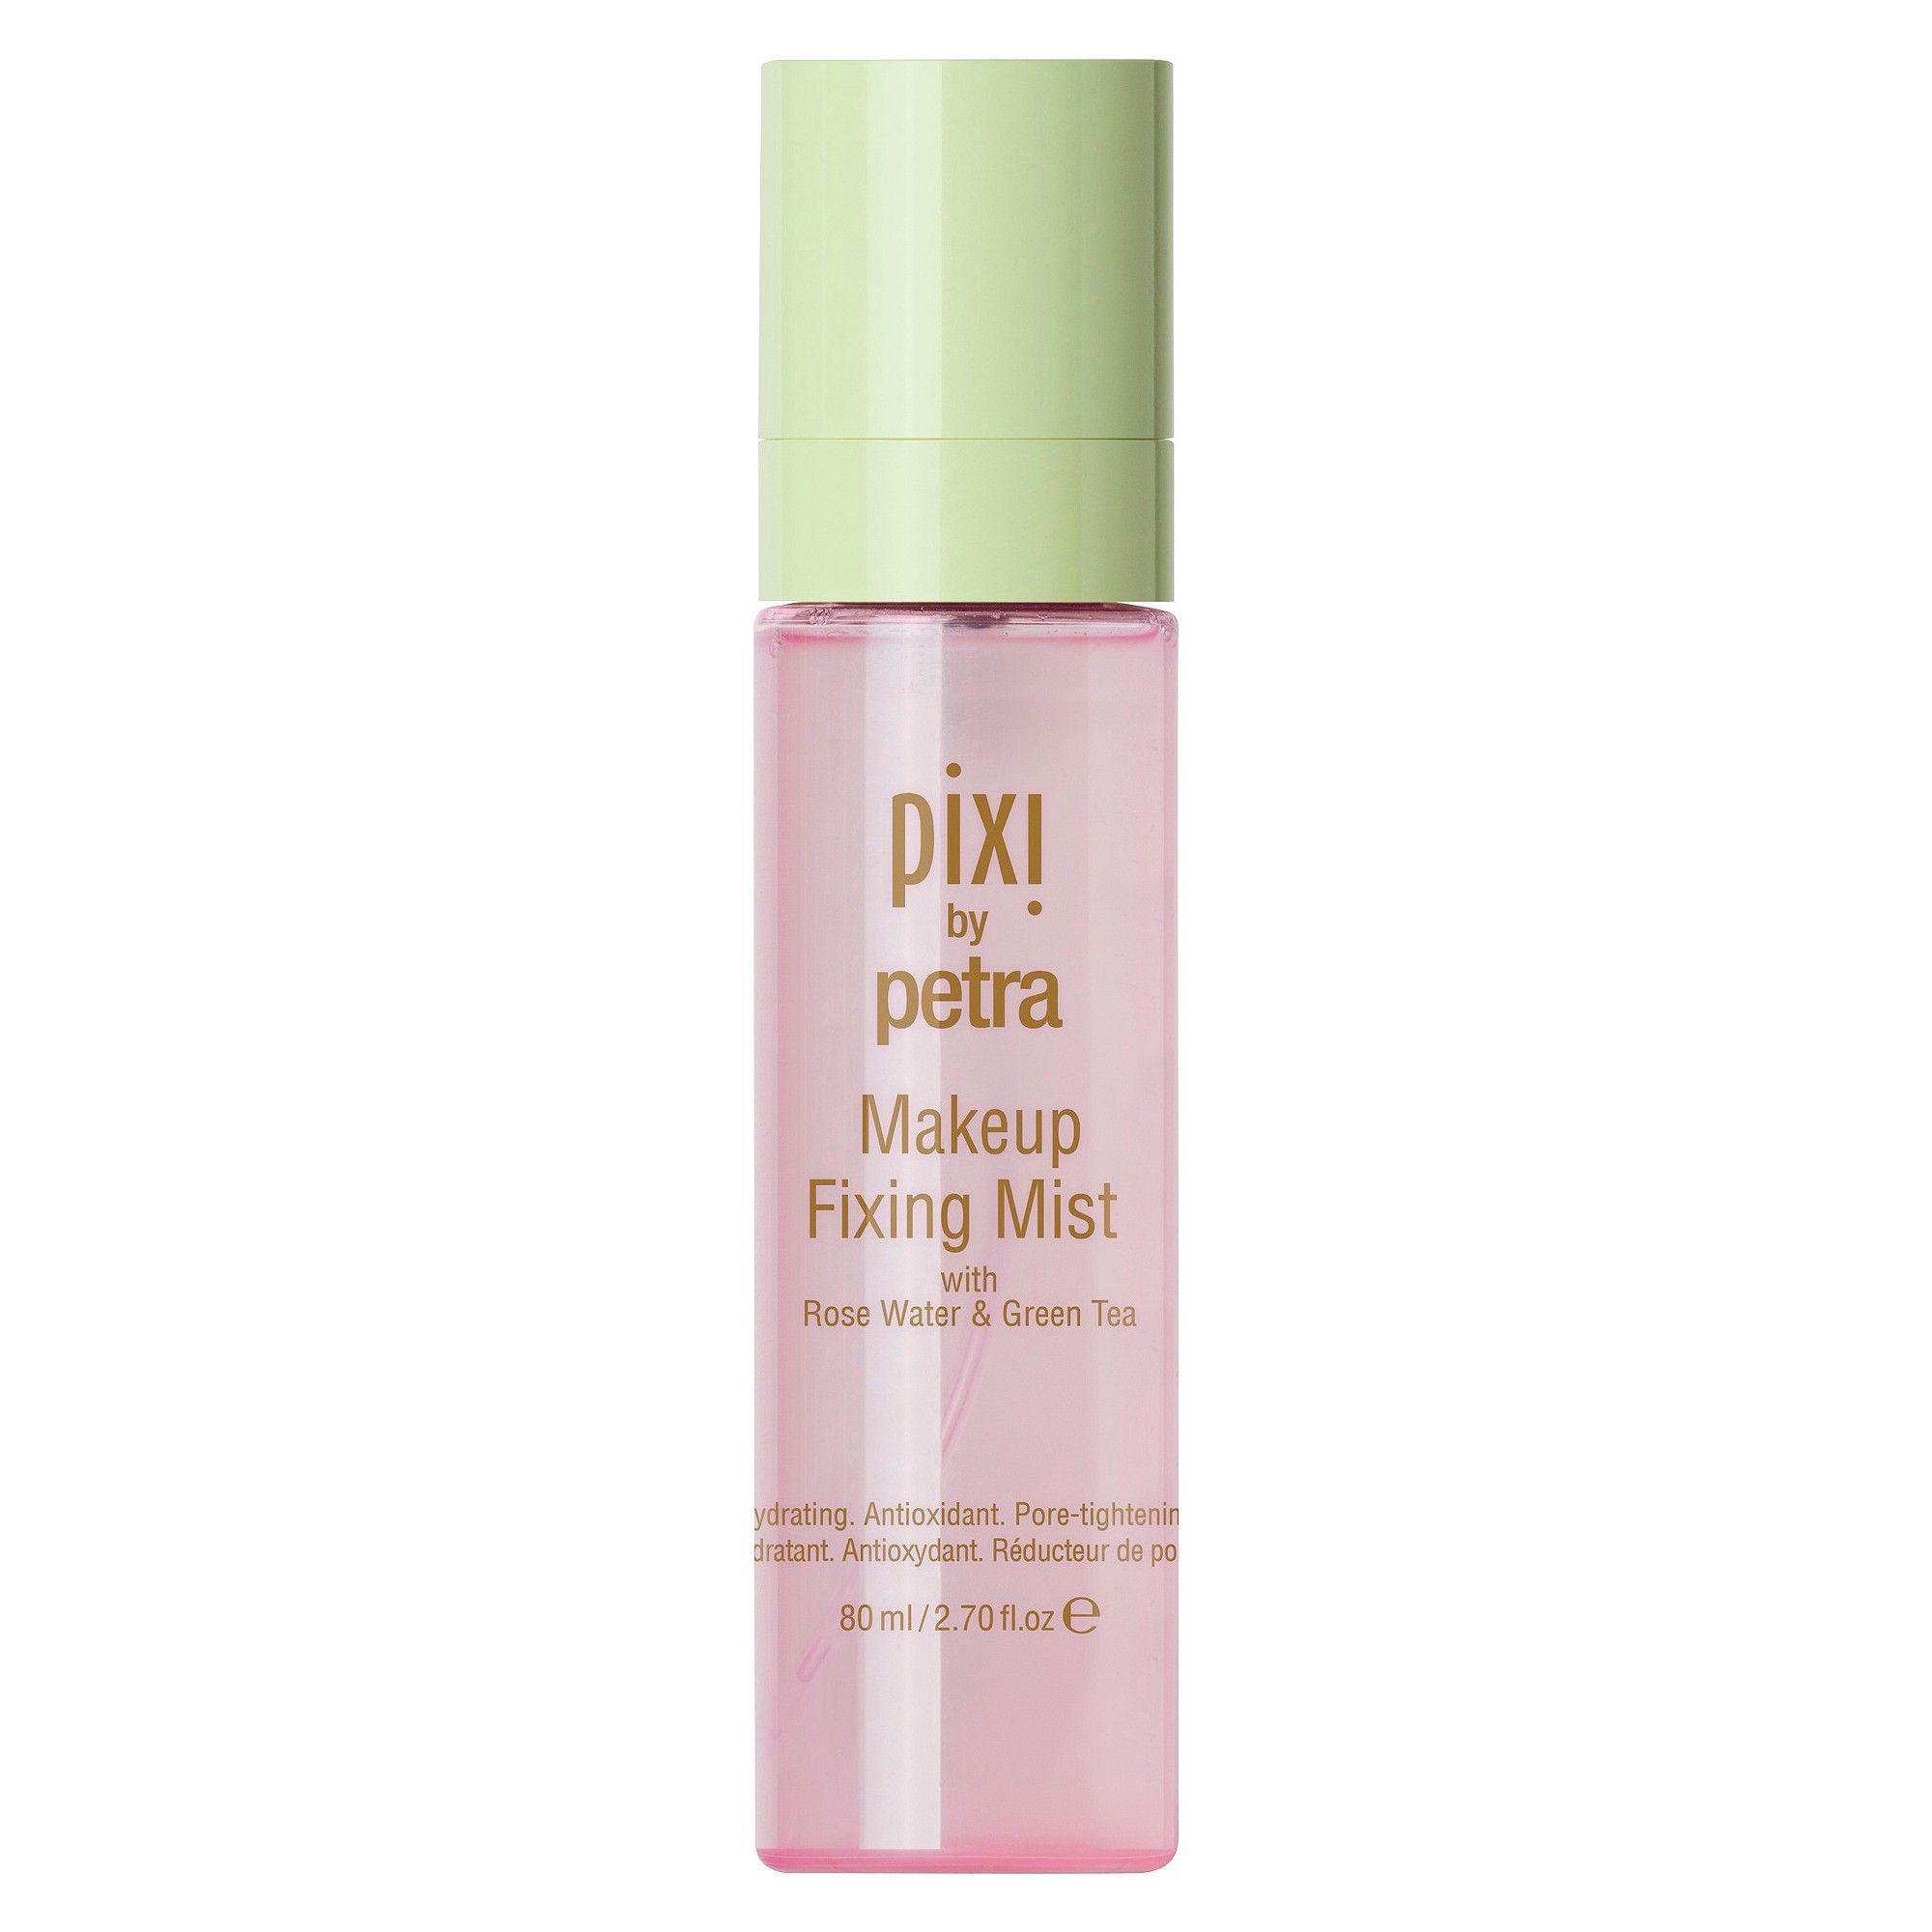 Pixi by Petra Makeup Fixing Mist 2.7 fl oz, Clear